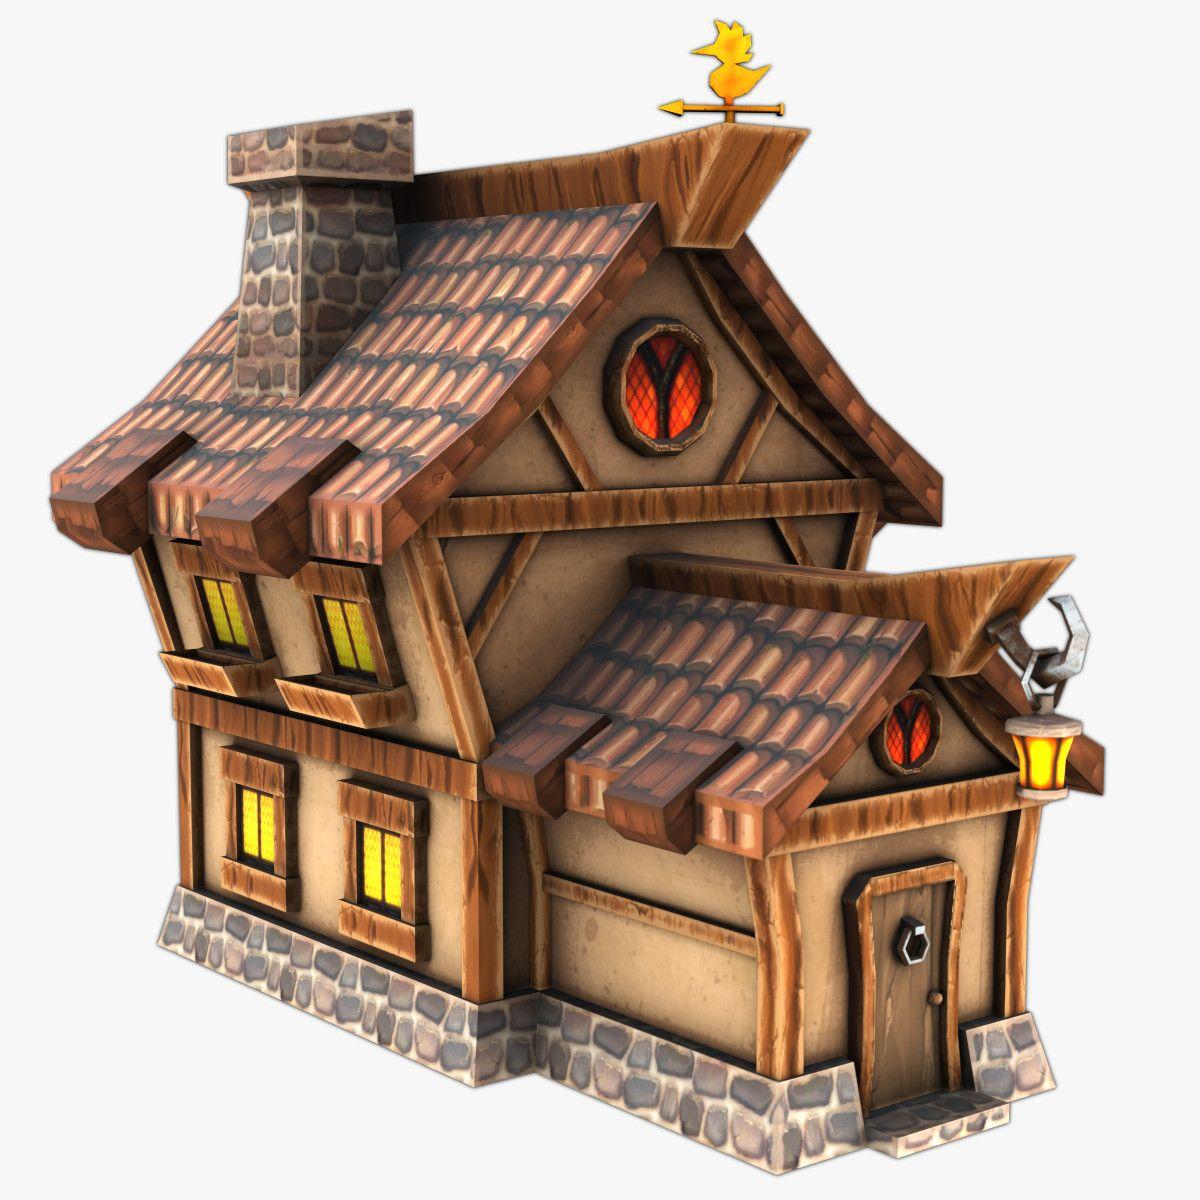 3d House Games Model House 3d Model Cartoon House House Games